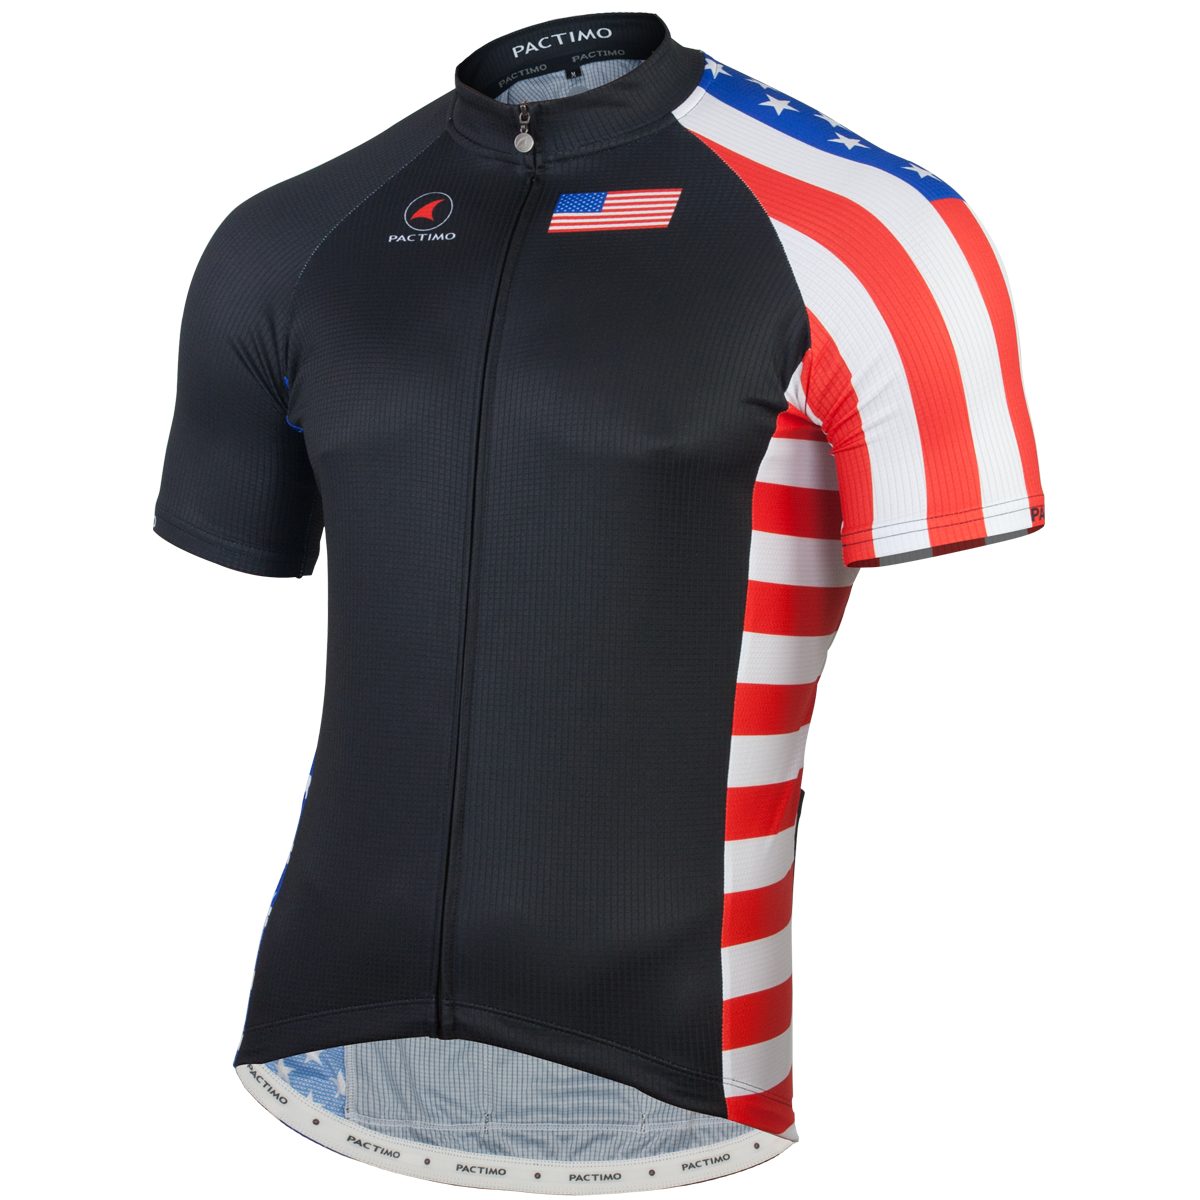 f8a14a96a Men s Designer Cycling Jersey - U.S.A - Pactimo